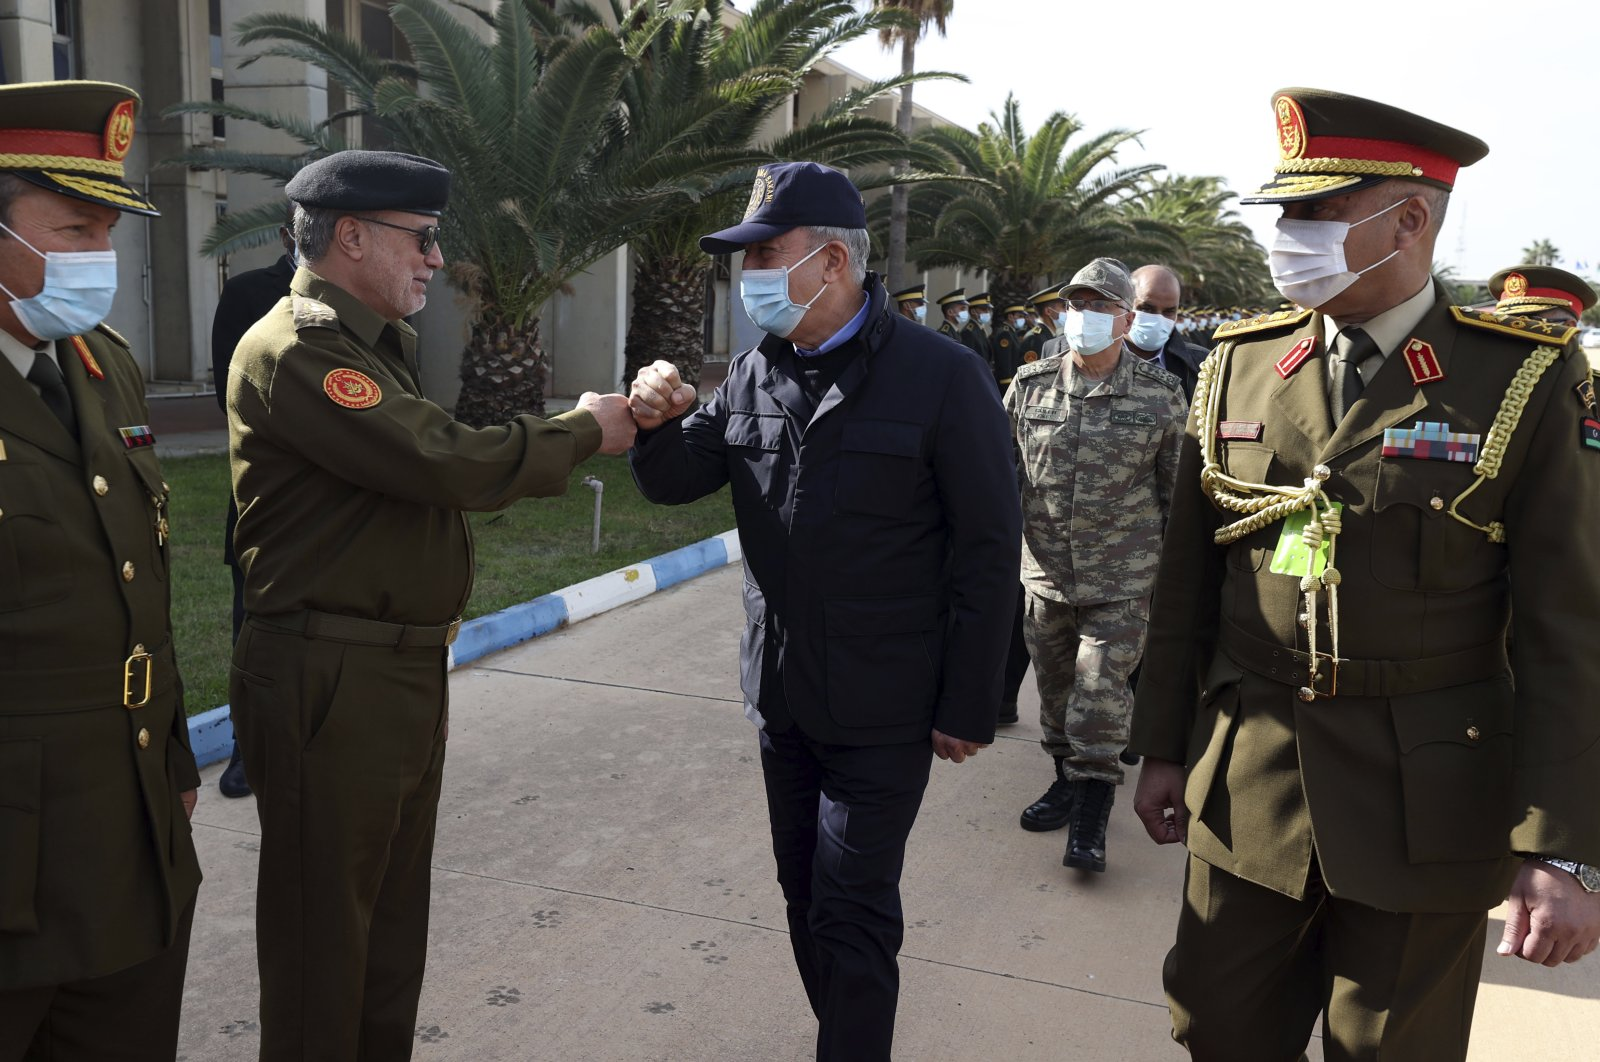 Turkey's Defense Minister Hulusi Aka (2nd R) and other top Turkish military commanders greet Libyan commanders, in Tripoli, Libya, Dec. 26, 2020. (AP Photo)